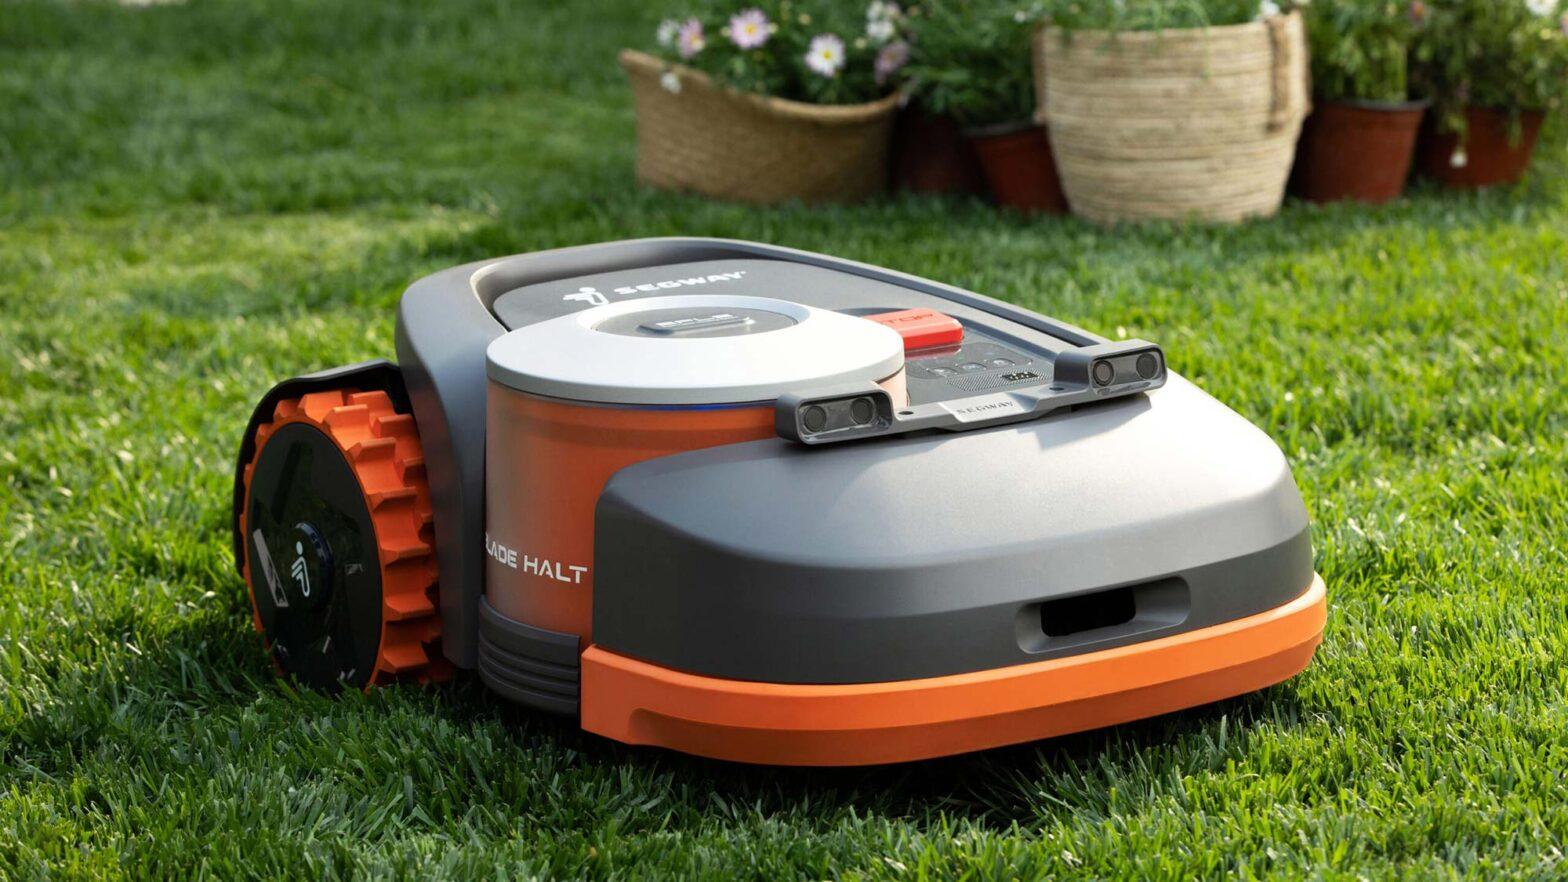 Segway Navimow Robot Lawn Mower